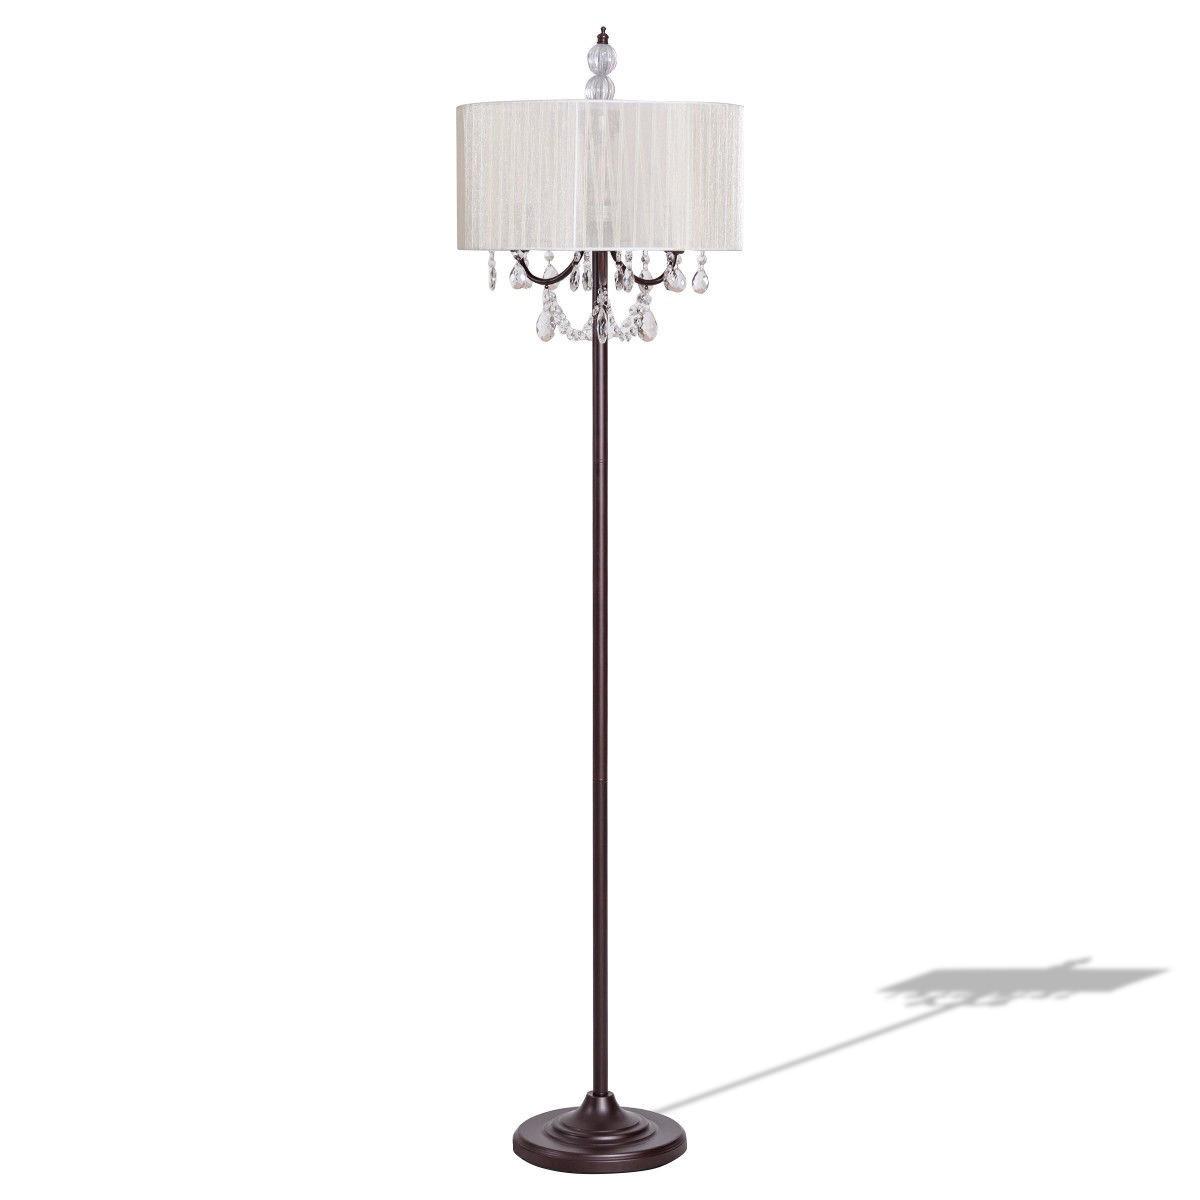 Cosway Elegant Sheer Shade Floor Lamp w/ Hanging Crystal LED Bulbs - $68.95 + Free Shipping